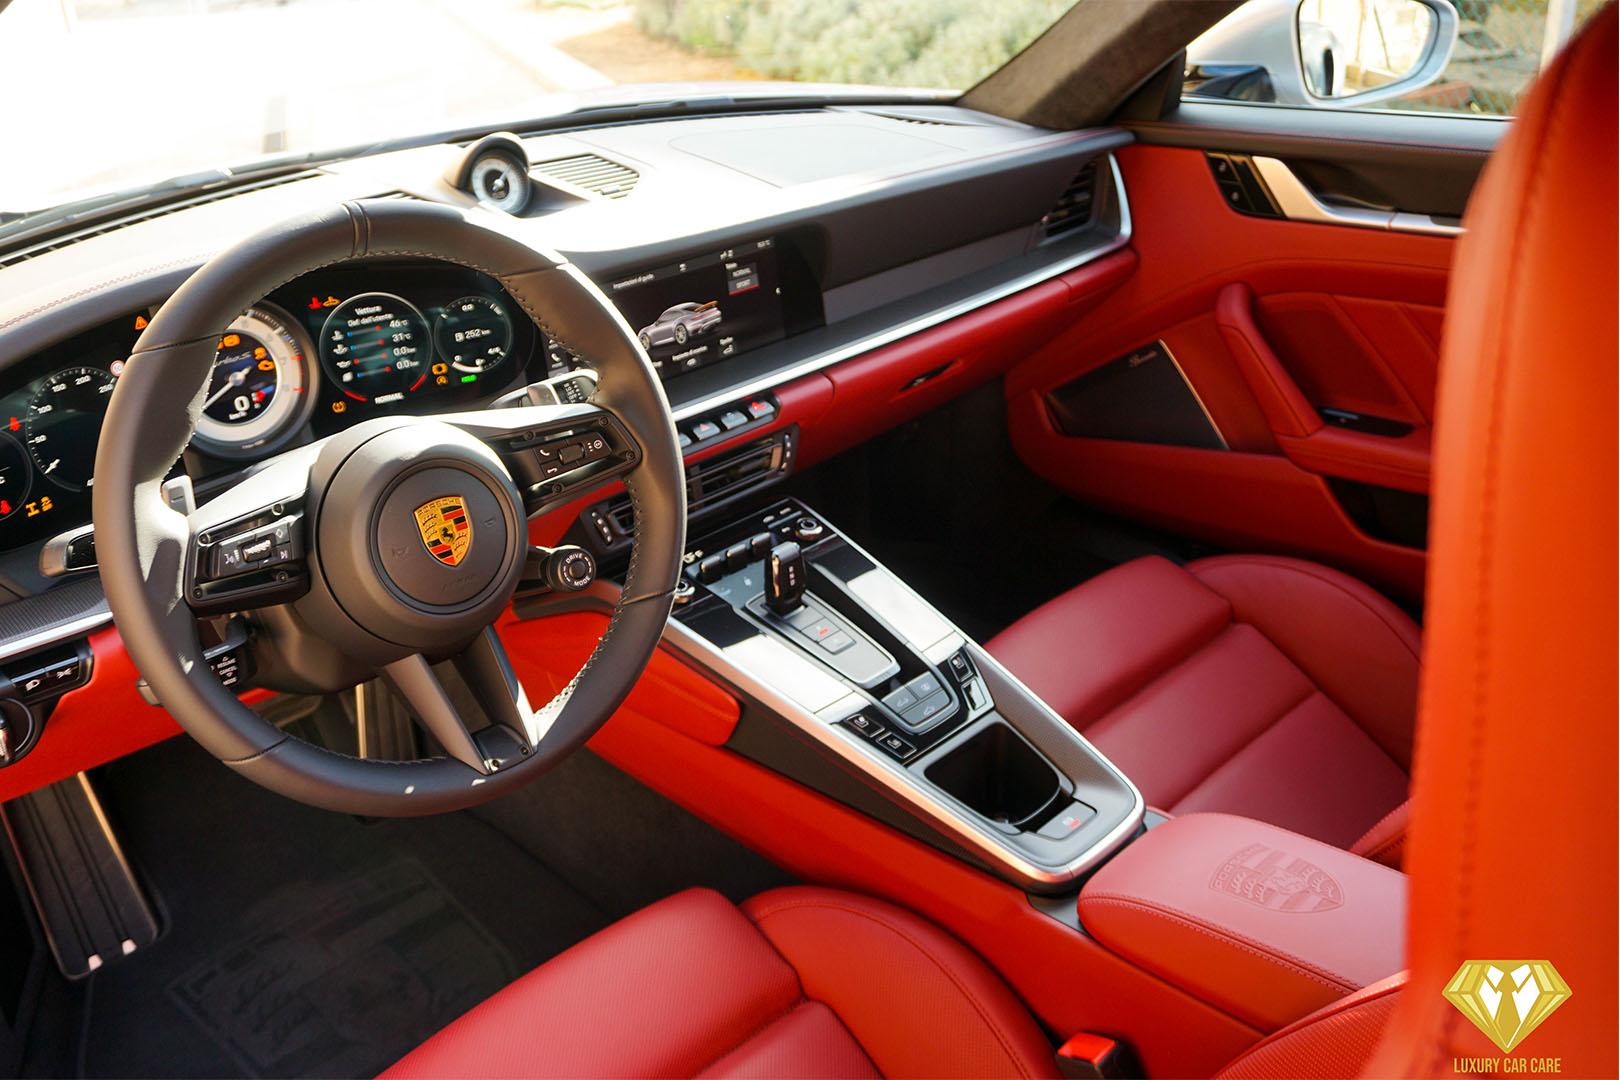 Detailing Turbo S